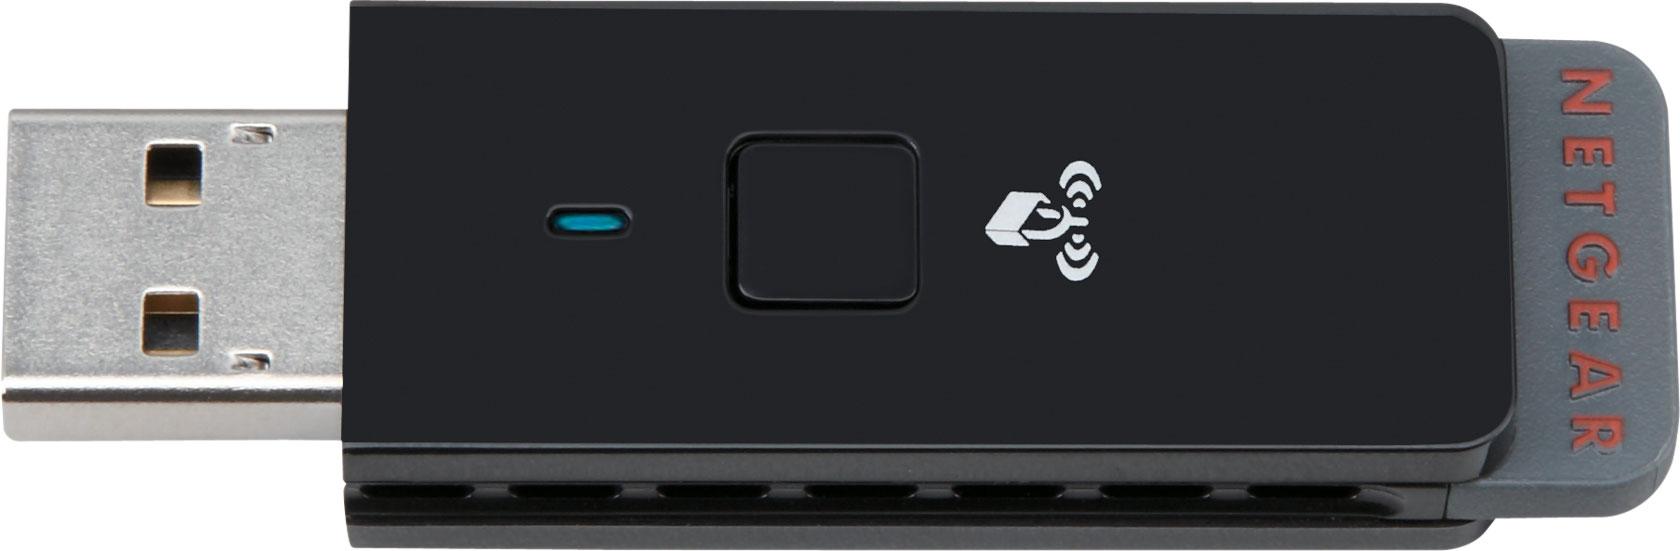 WNA1100-RL | Wireless USB Adapter - Roland